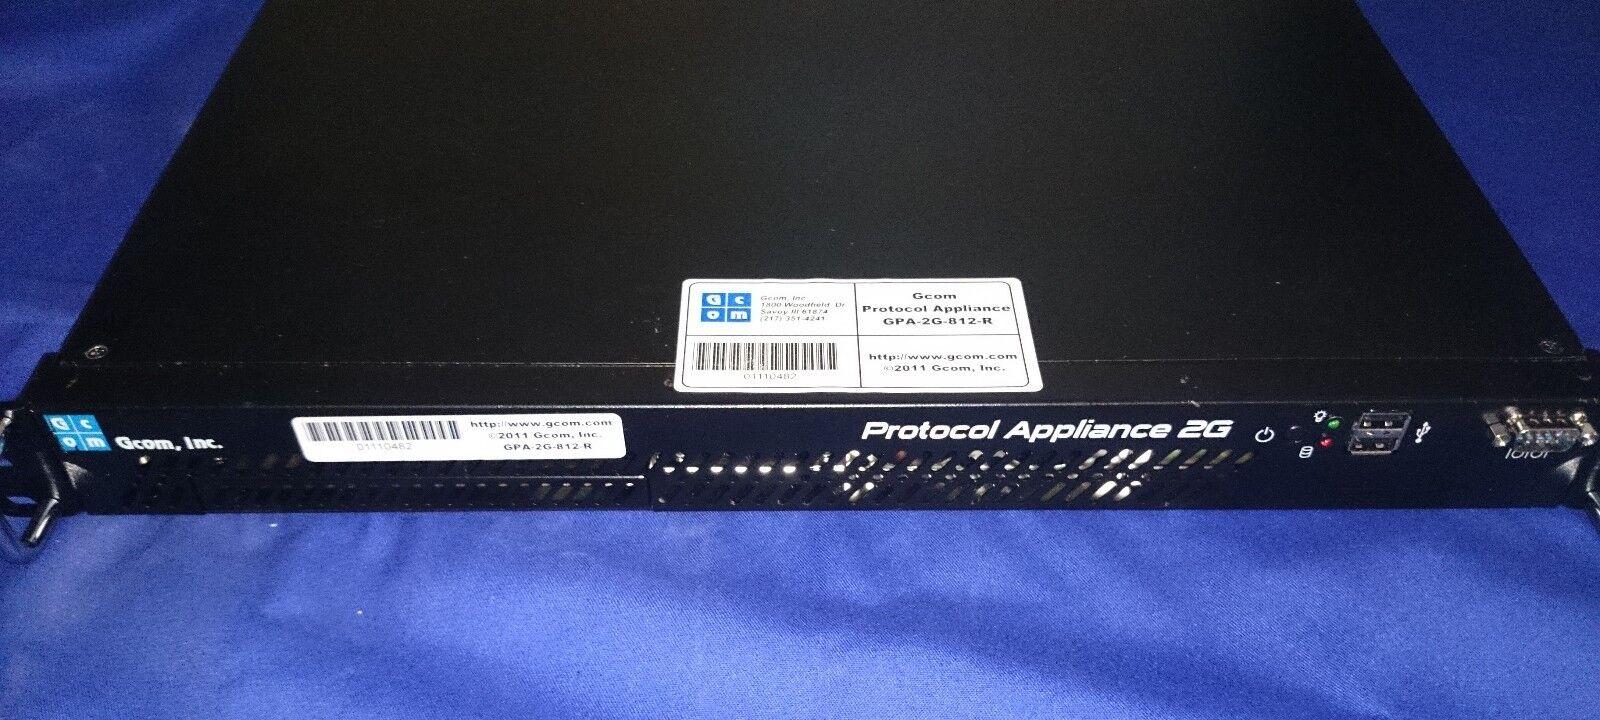 GCOM Predocol Appliance 2G GPA-2G-812-R